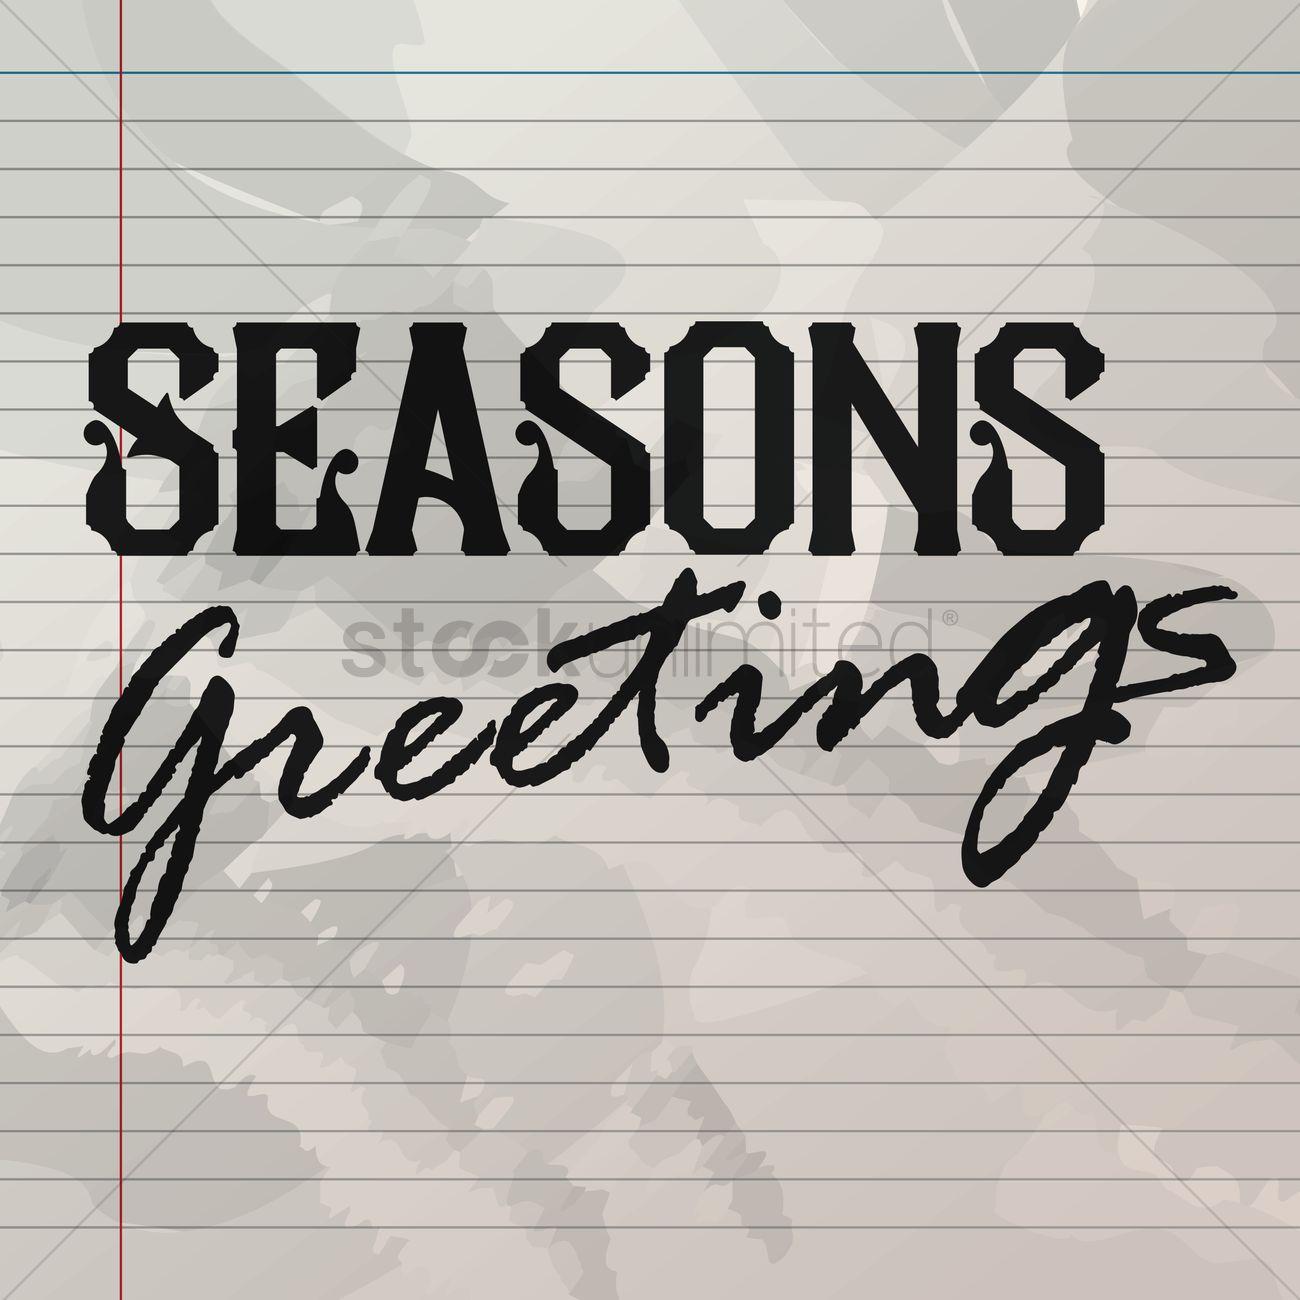 Seasons Greetings On Line Paper Vector Image 1827412 Stockunlimited